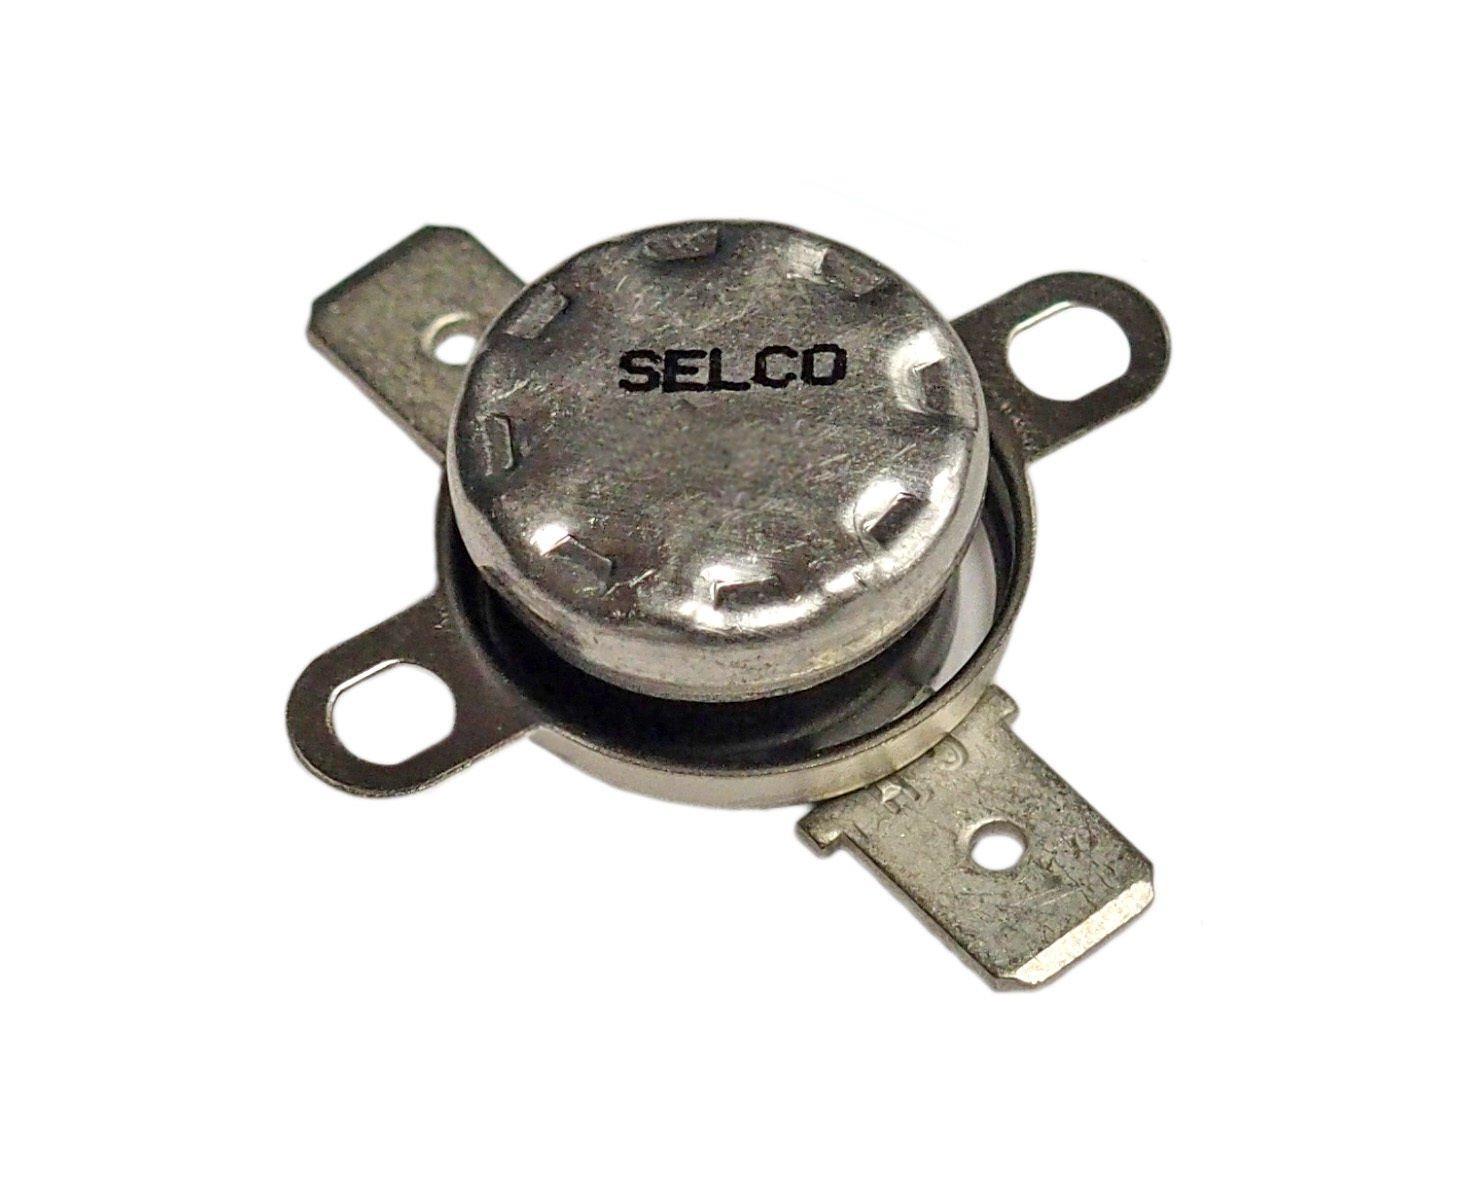 Amazon New Selco Ca85 85 Degree Temperature Controlled Switch